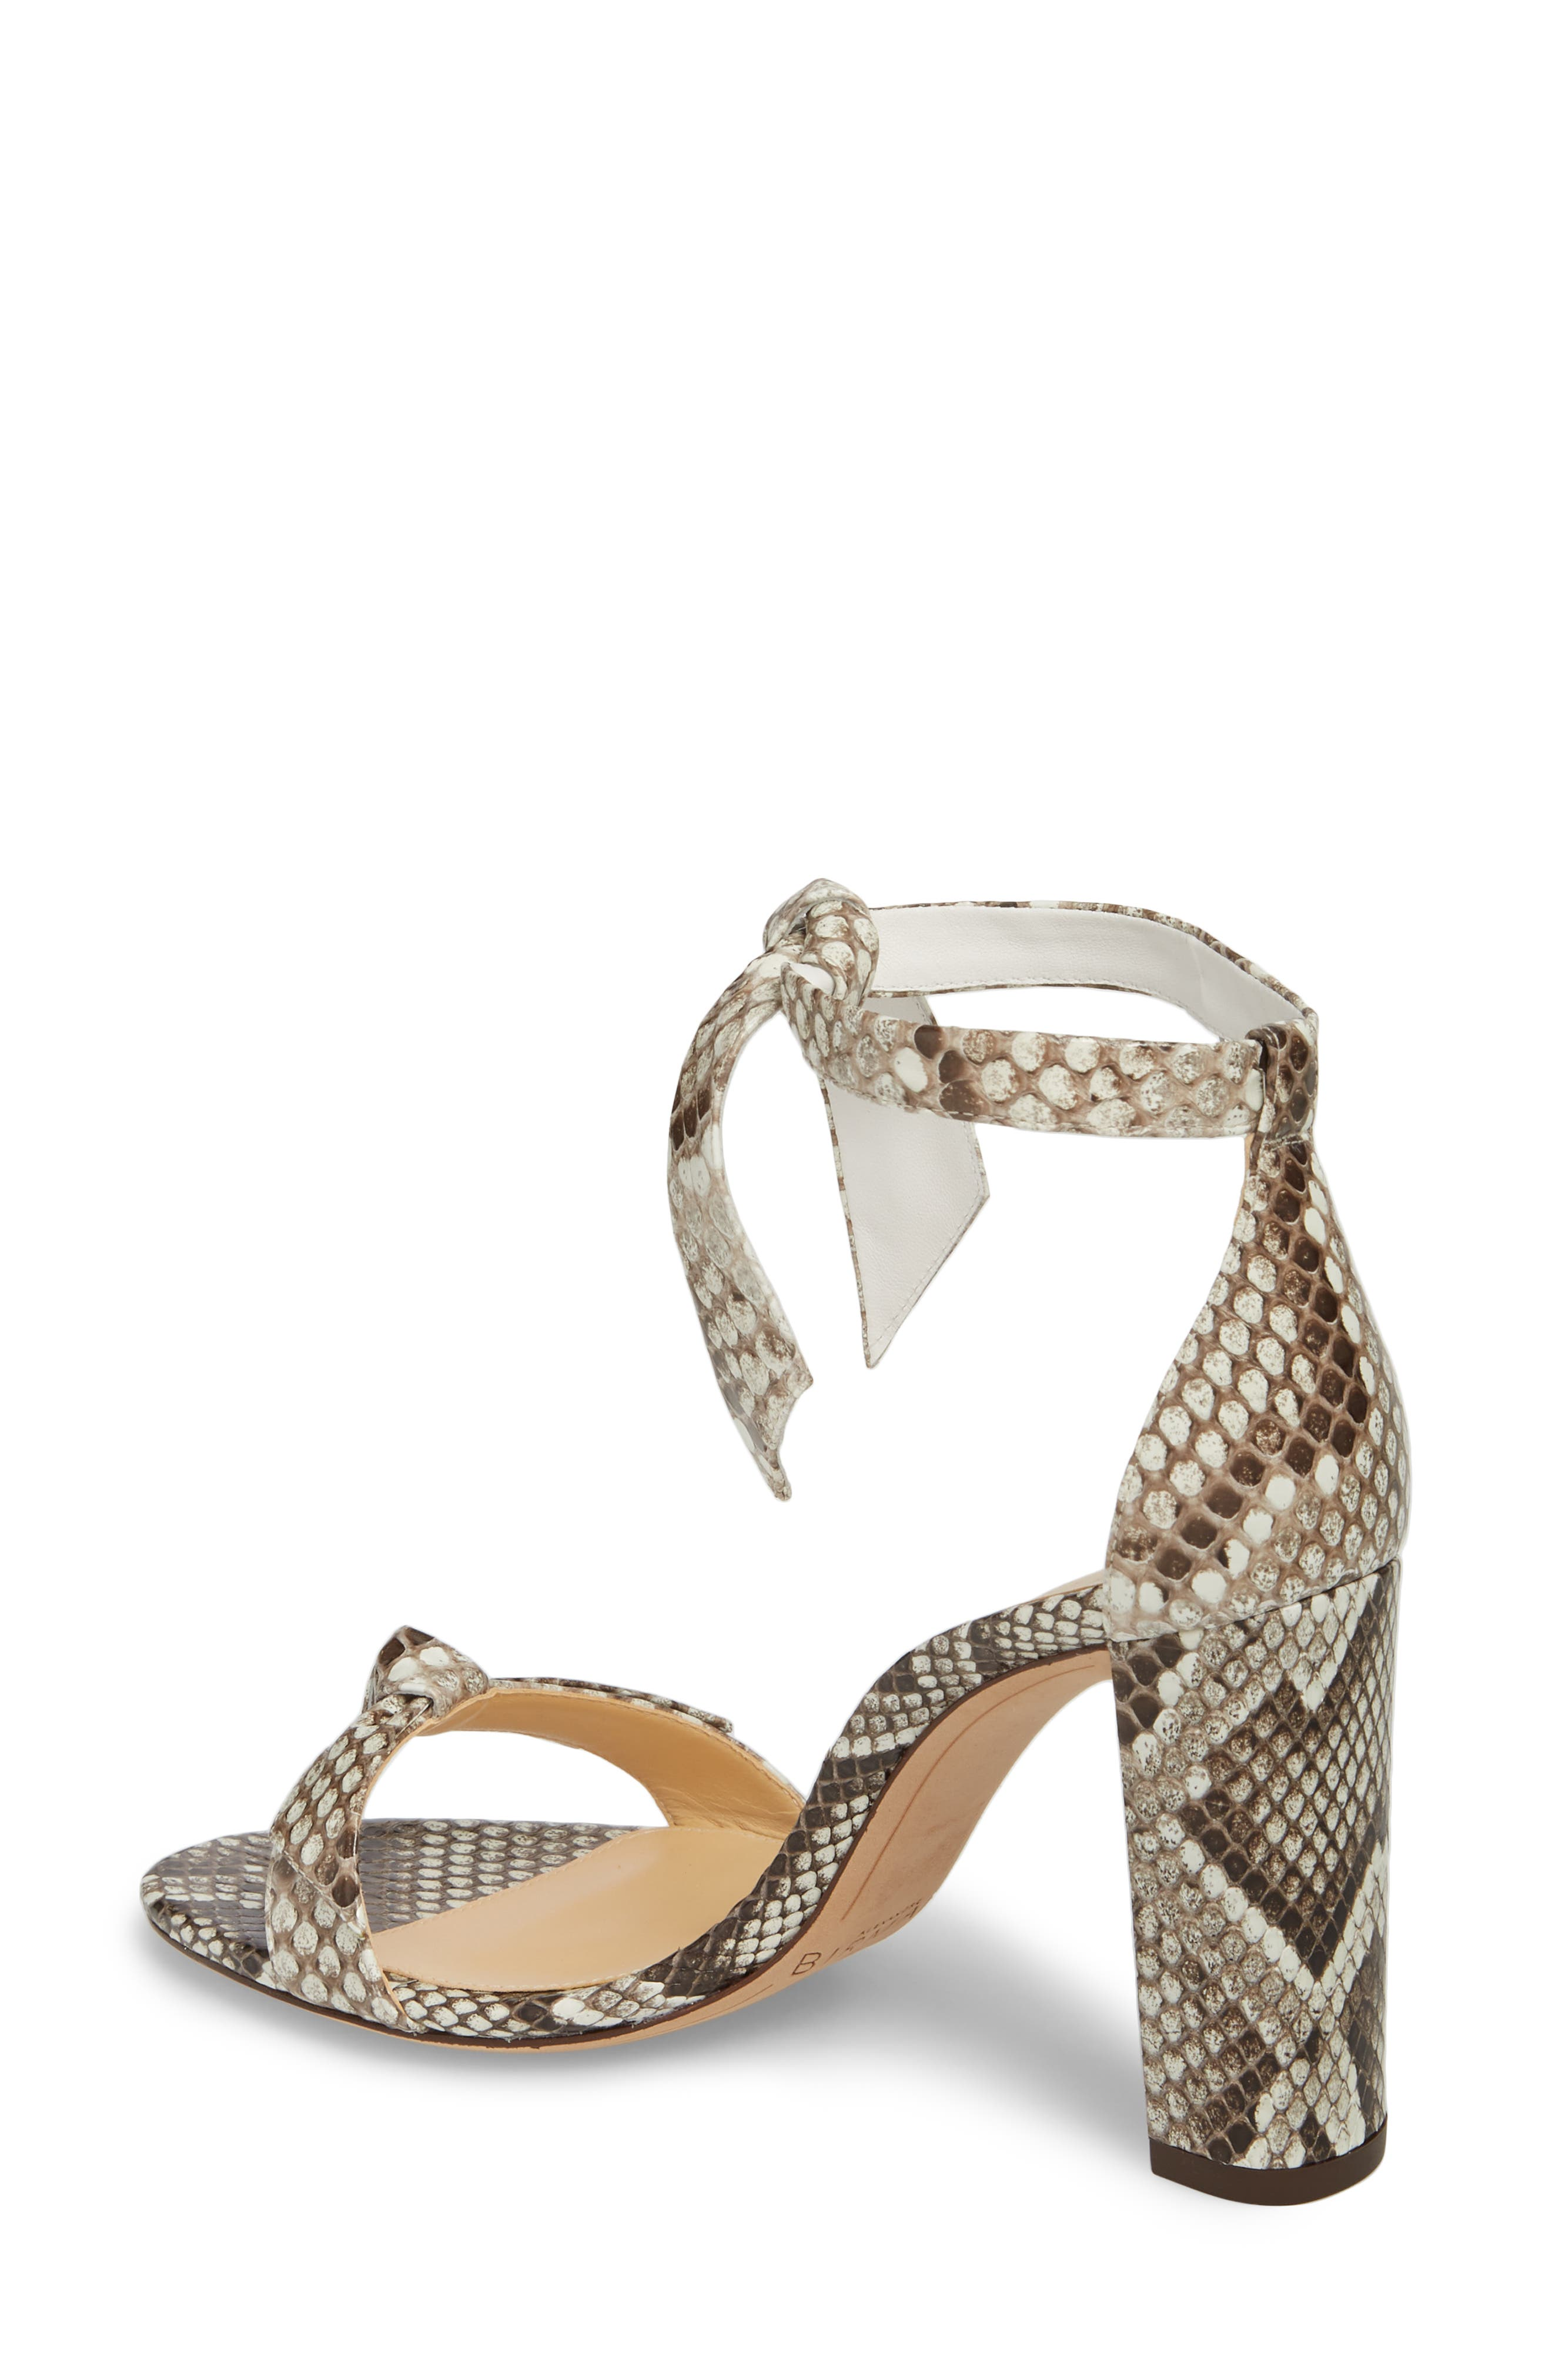 Clarita Genuine Python Ankle Tie Sandal,                             Alternate thumbnail 2, color,                             Natural